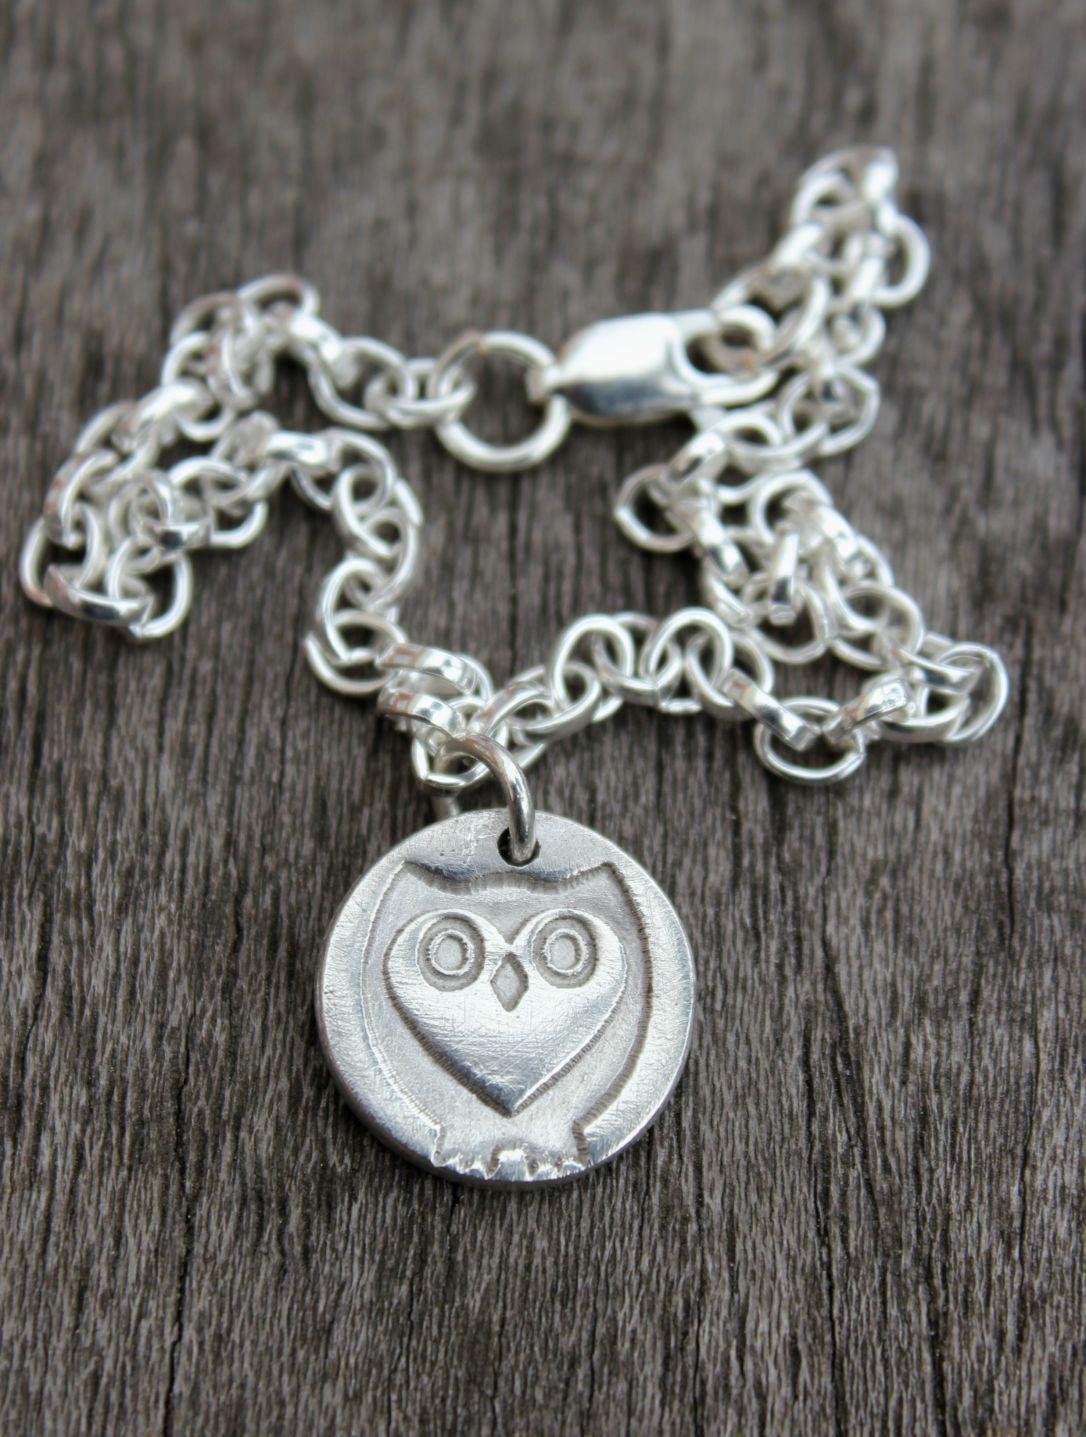 Tiny silver owl bracelet, silver owl bracelet, heart owl bracelet by little silver hedgehog